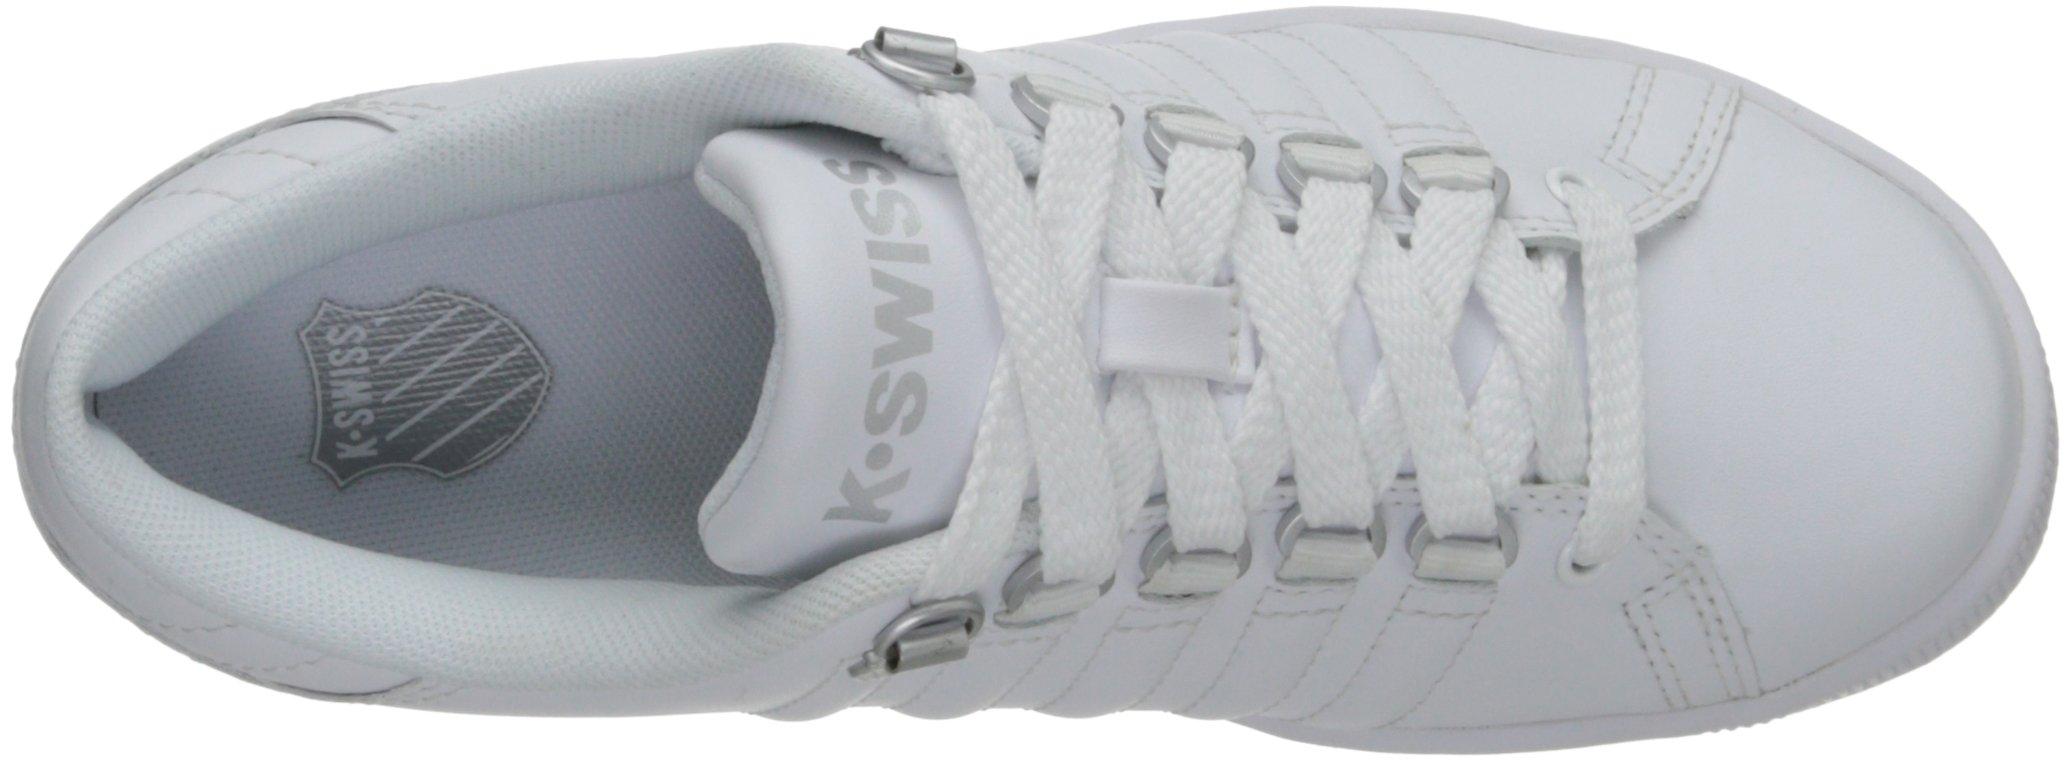 K-Swiss 8110 Lozan Sneaker (Big Kid),White/White/Silver,3.5 M US Big Kid by K-Swiss (Image #8)